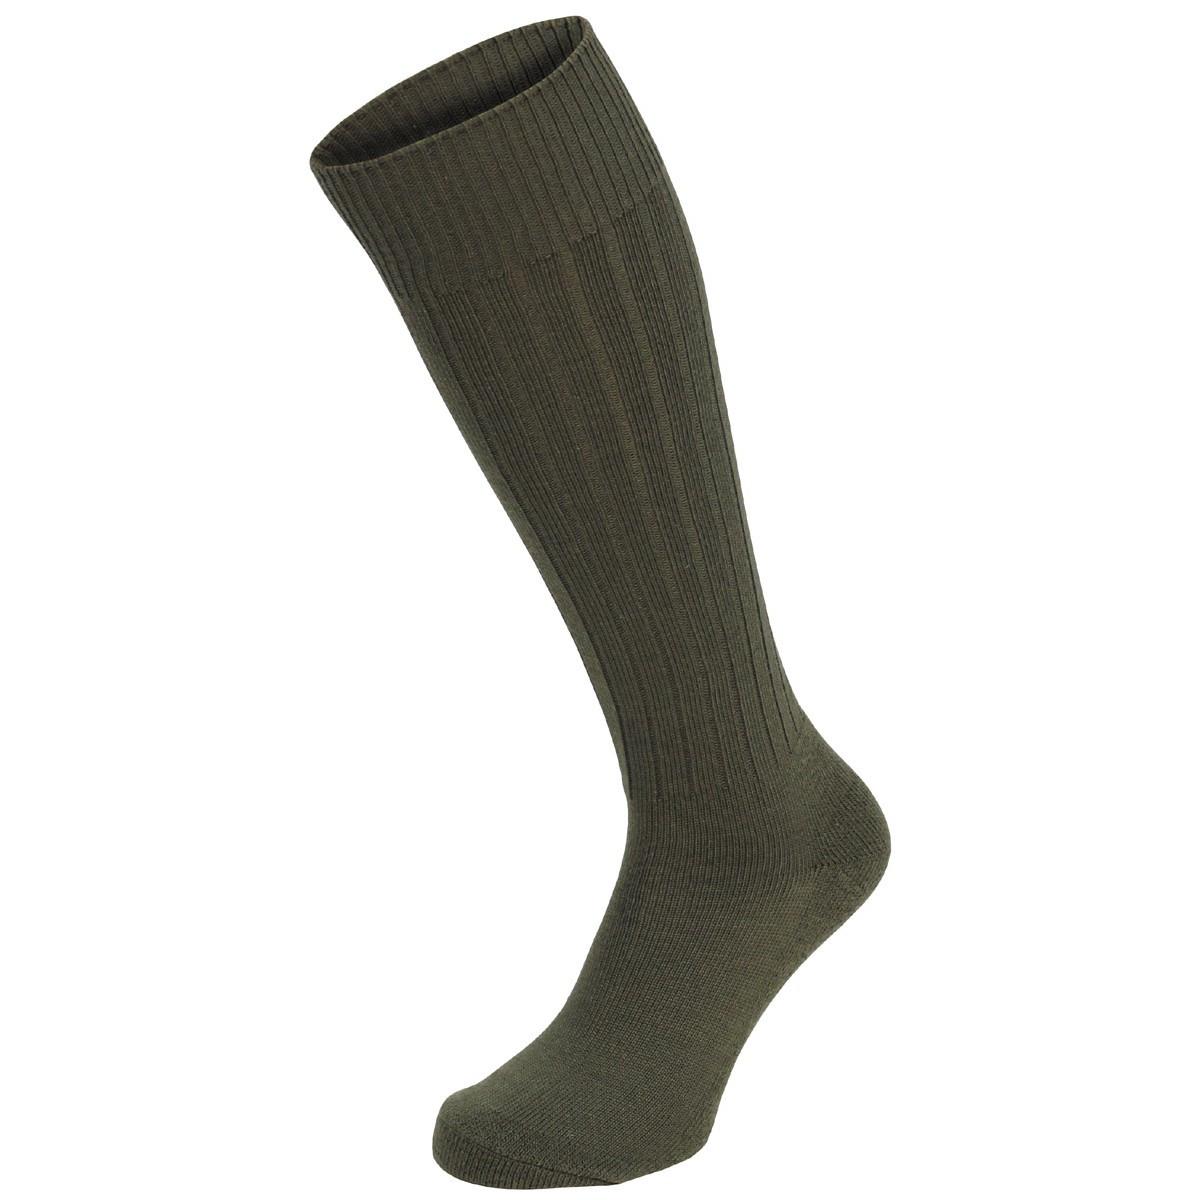 Зимние армейские носки Бундесвера тёмно-зелёные MFH